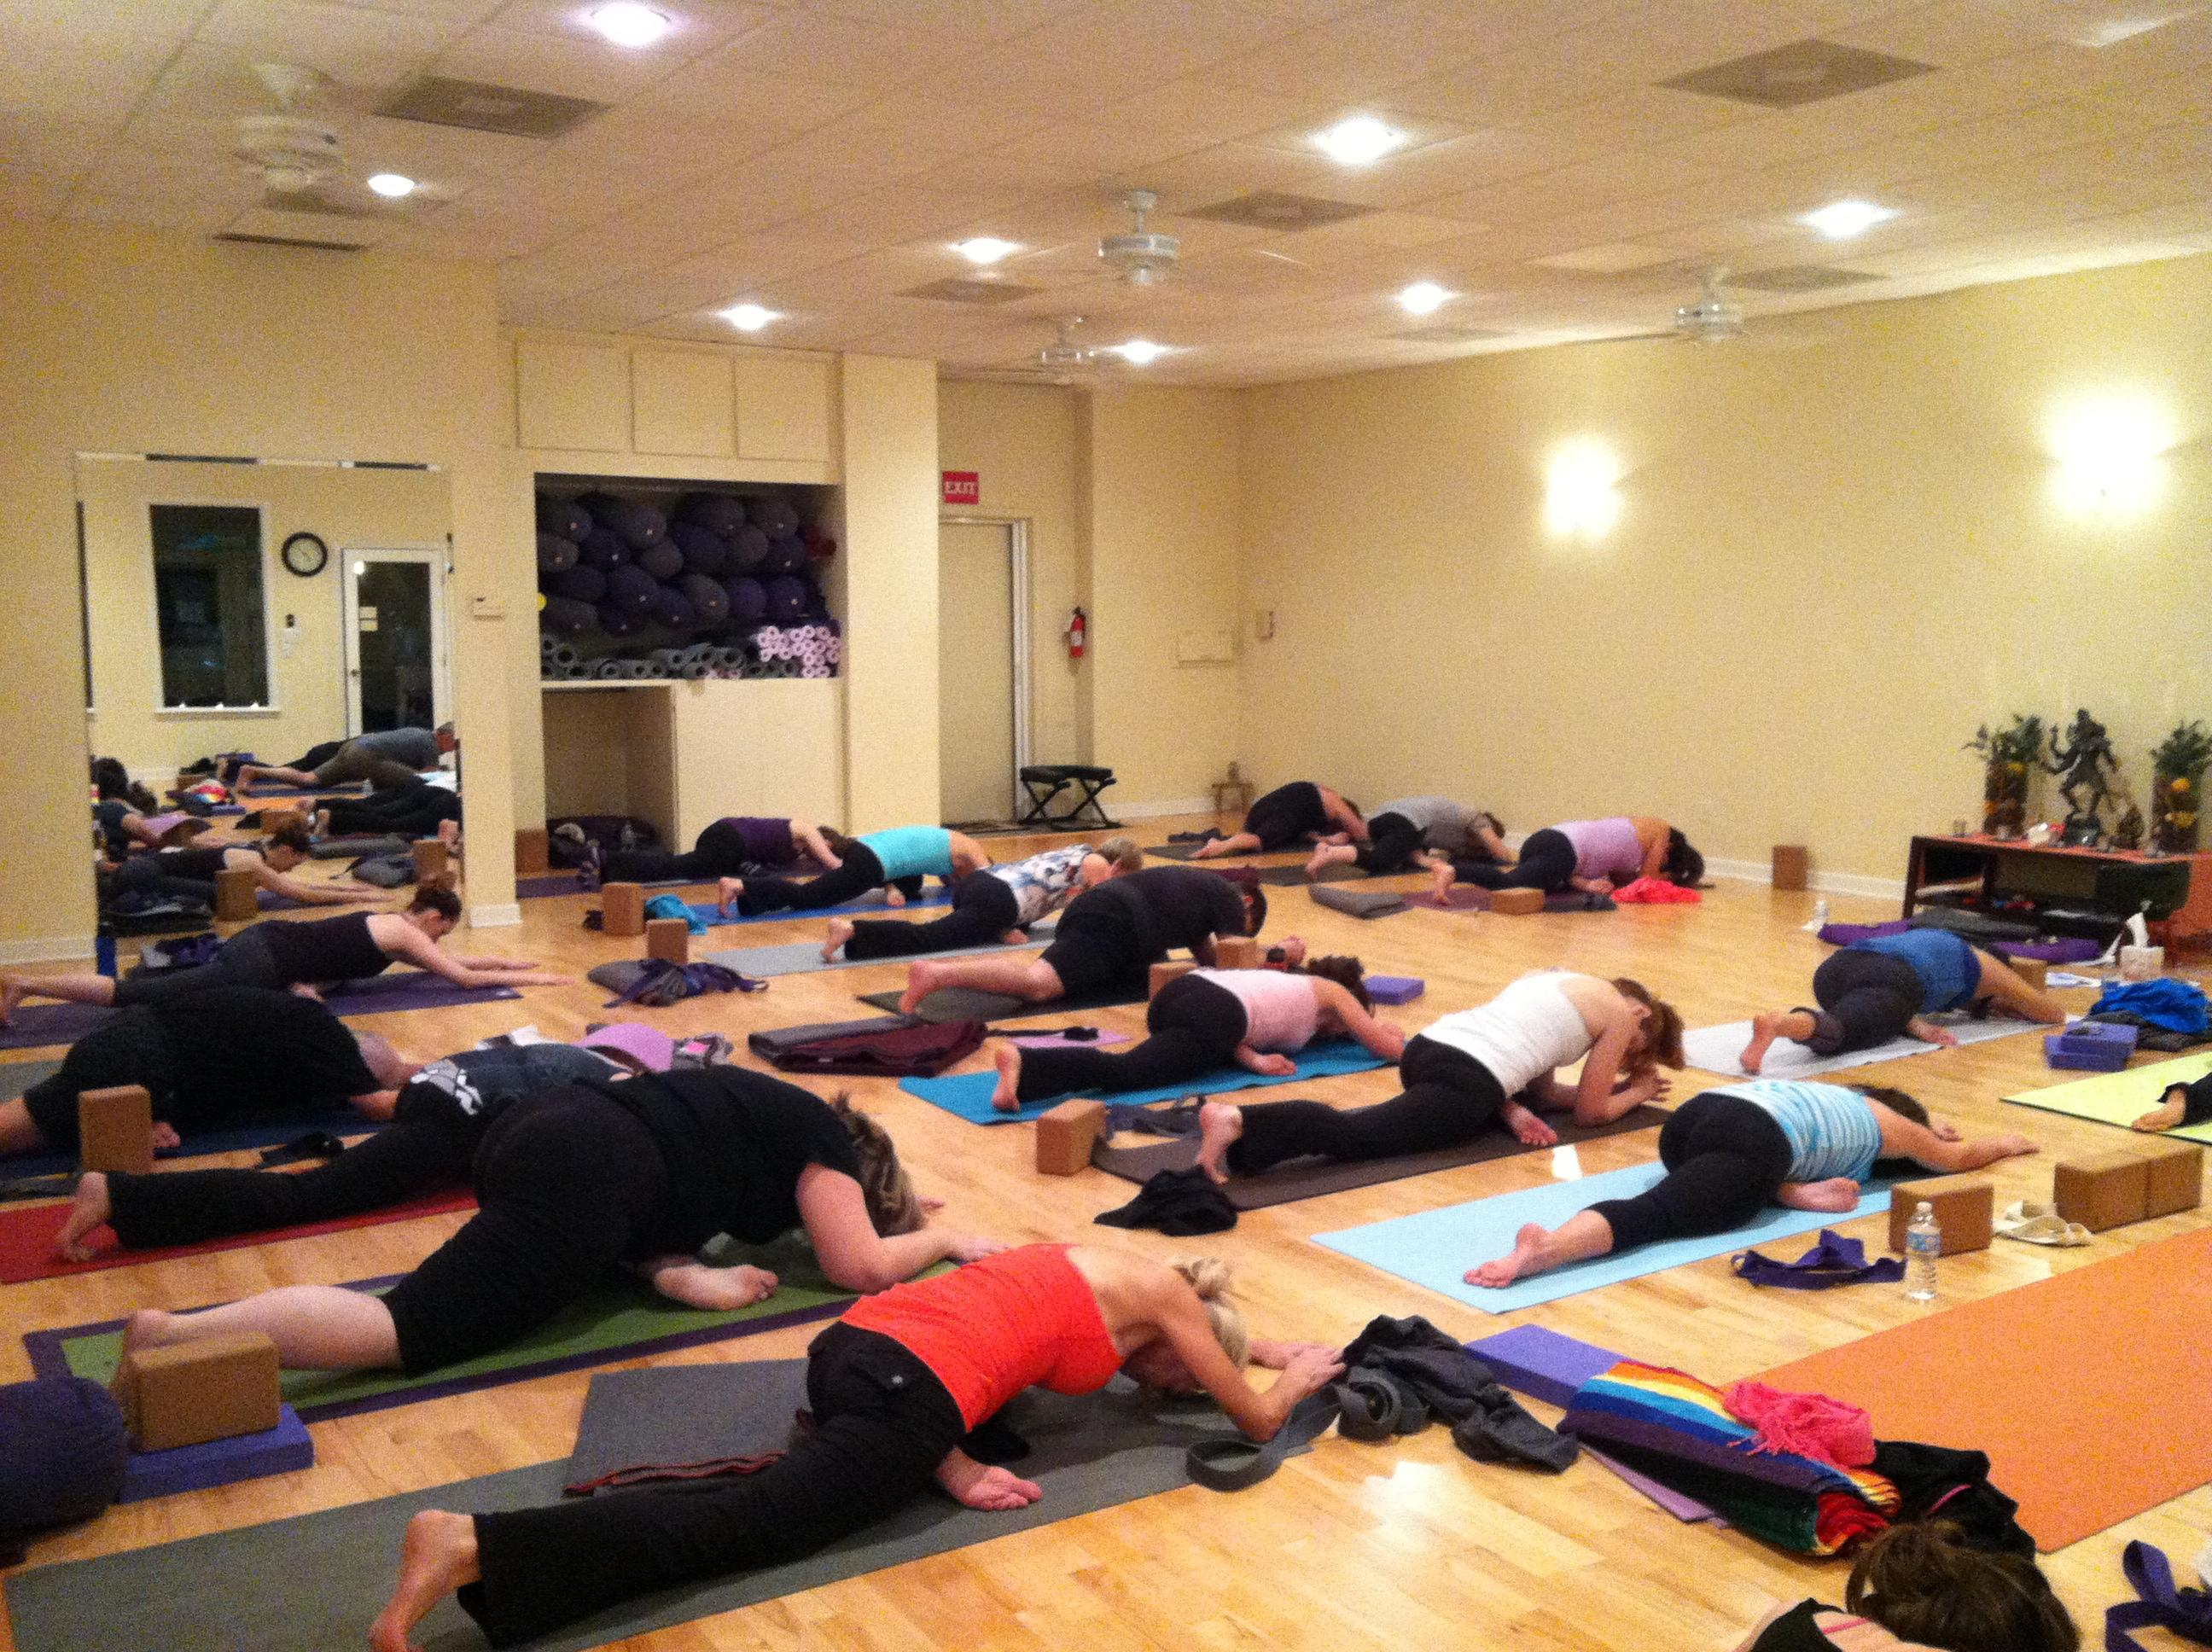 The Woodlands Yoga Studio image 2